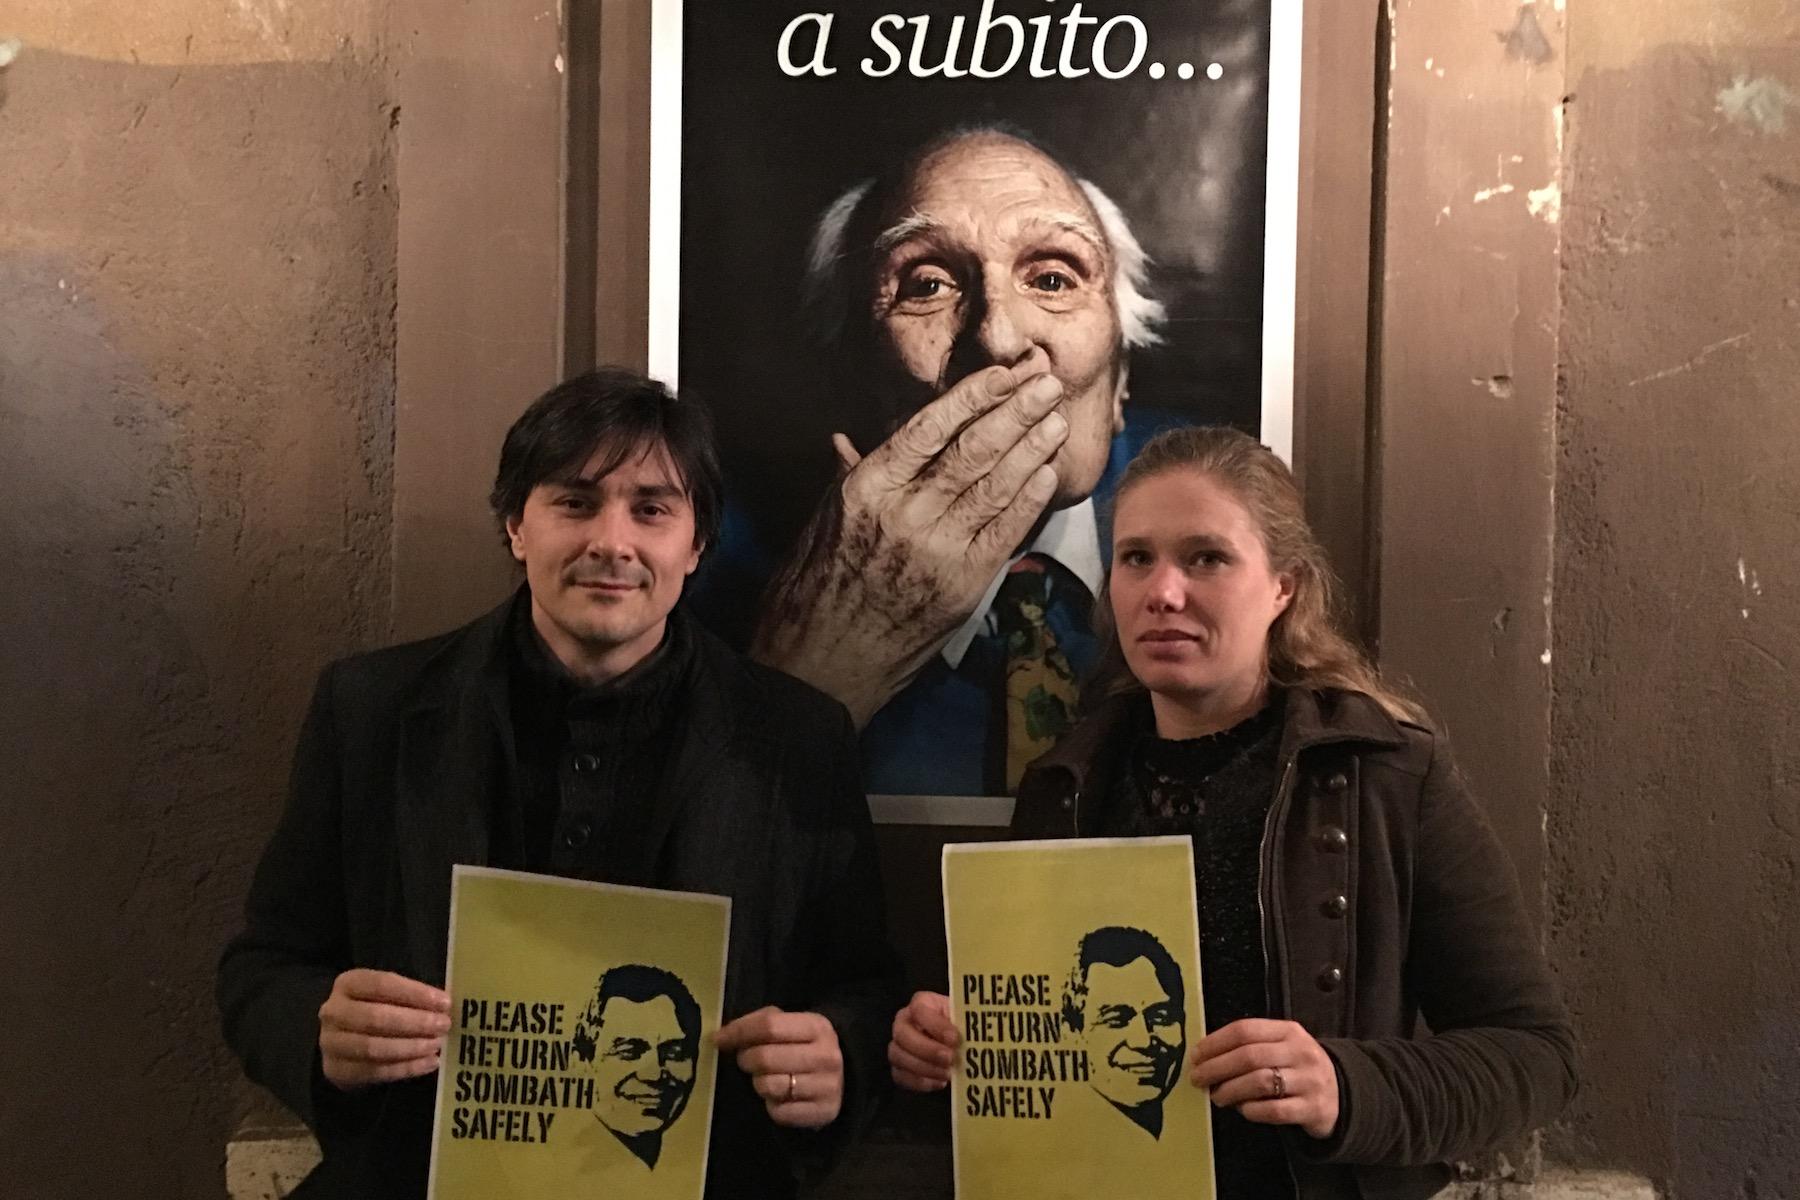 Rome-Matteo Angioli & Laura Harth